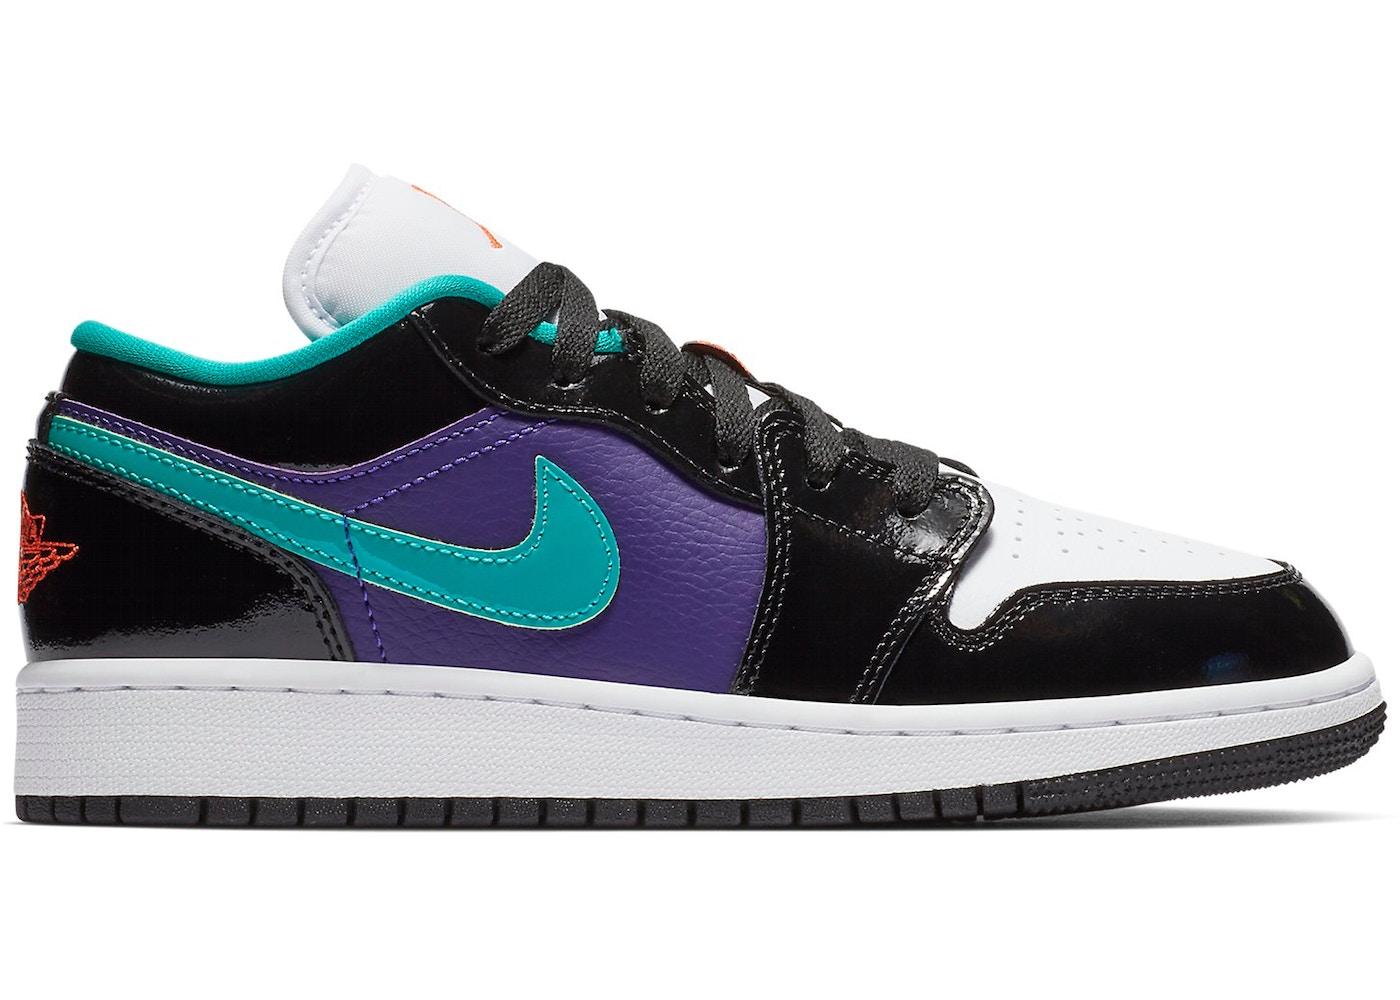 Jordan 1 Low Black Court Purple Turbo Green (GS)